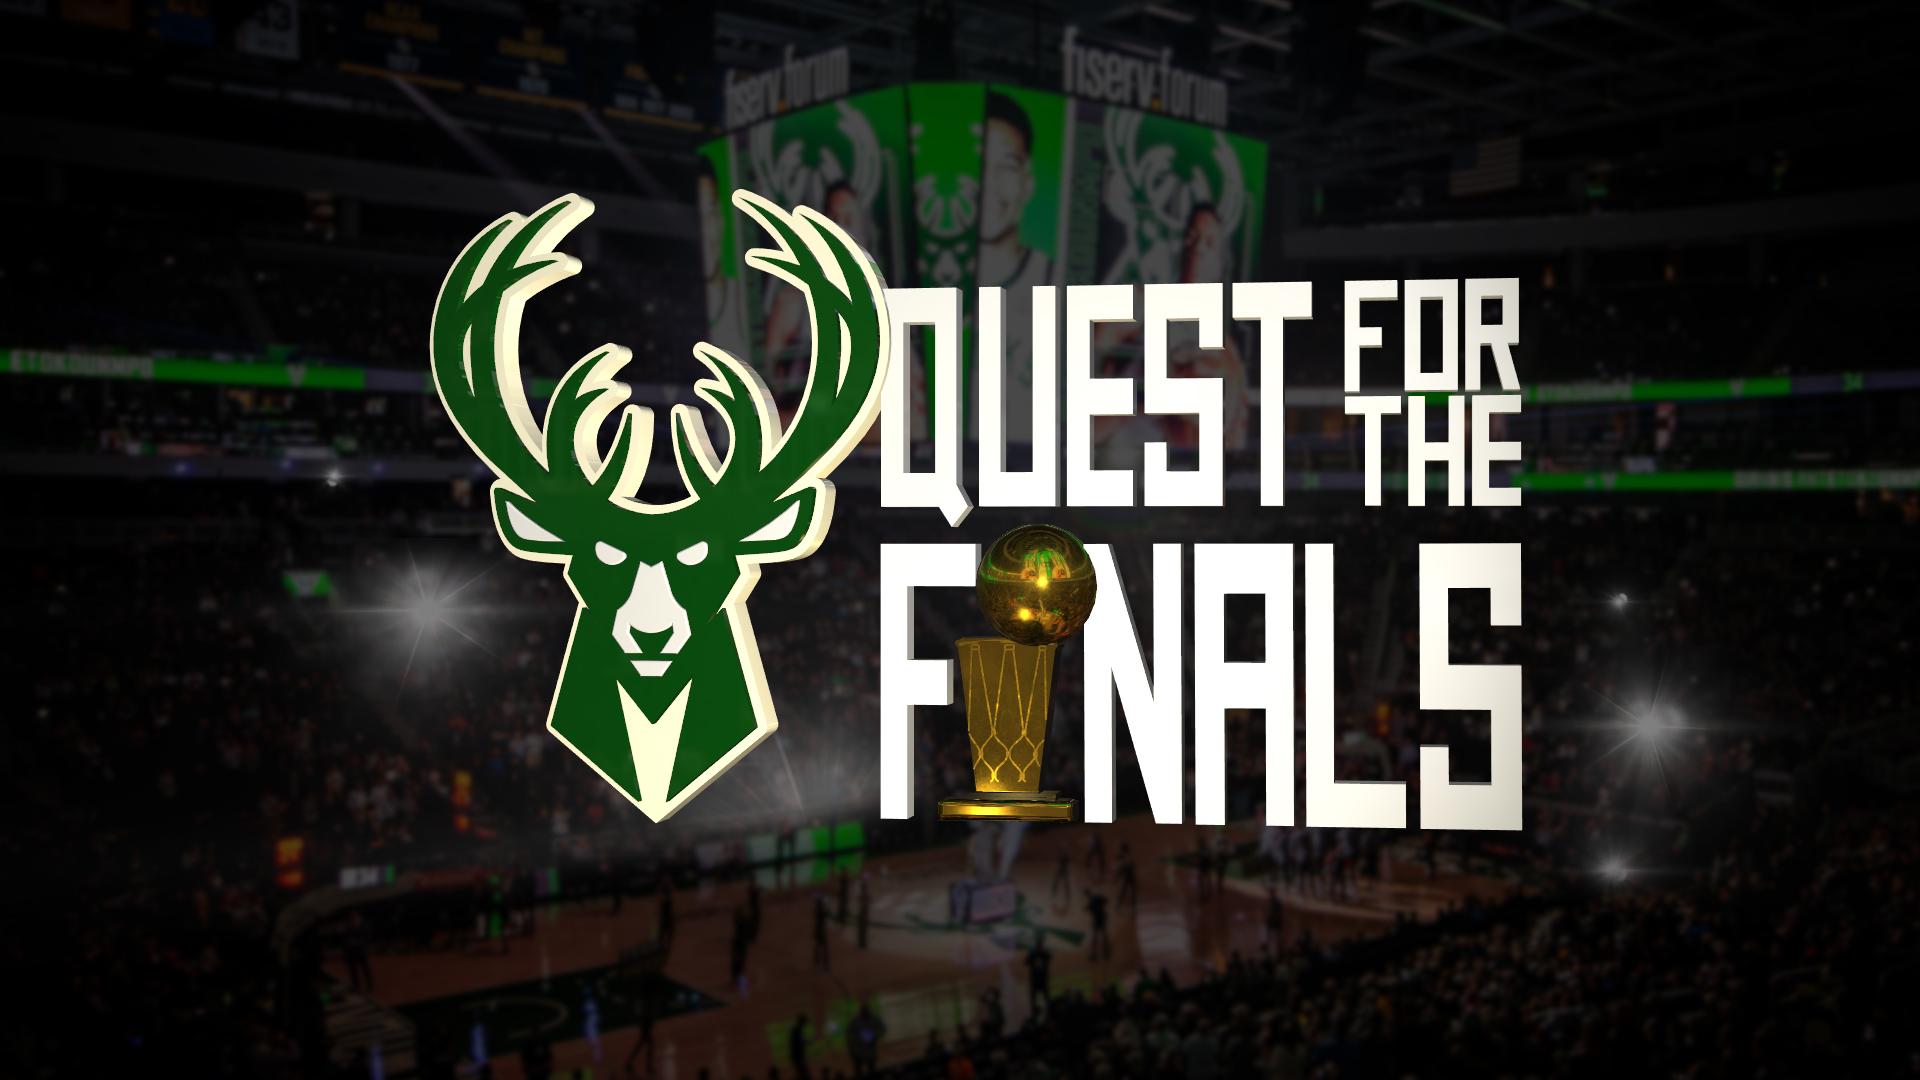 Schedule Released For Bucks Vs Raptors Eastern Conference